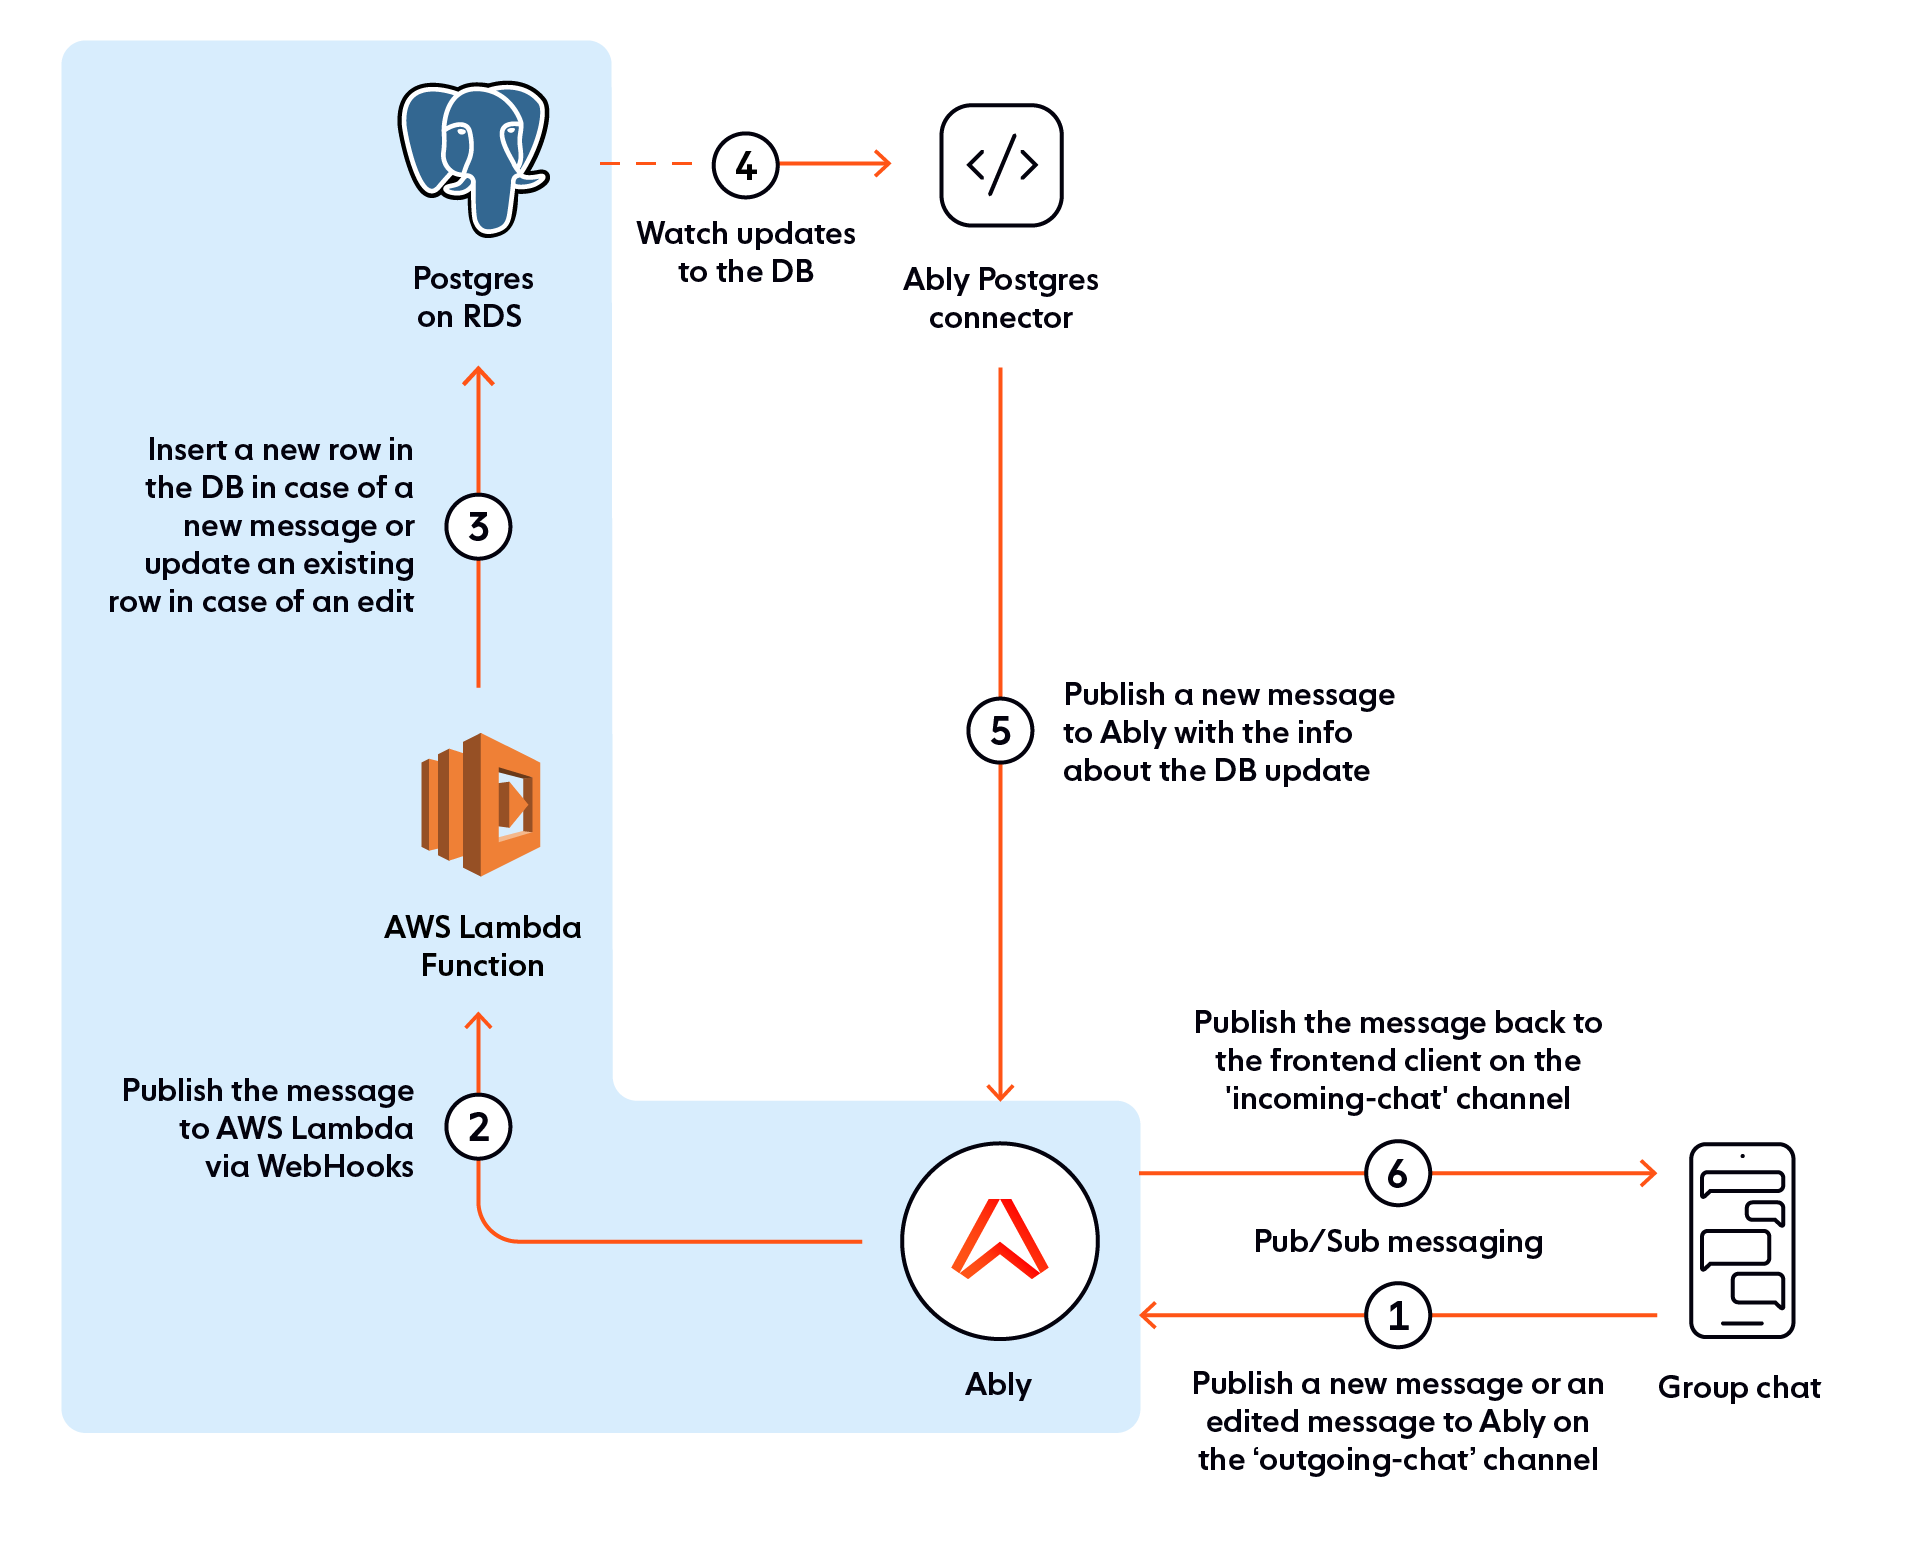 The PostgresDB setup of the editable chat app, including AWS Lambda Function